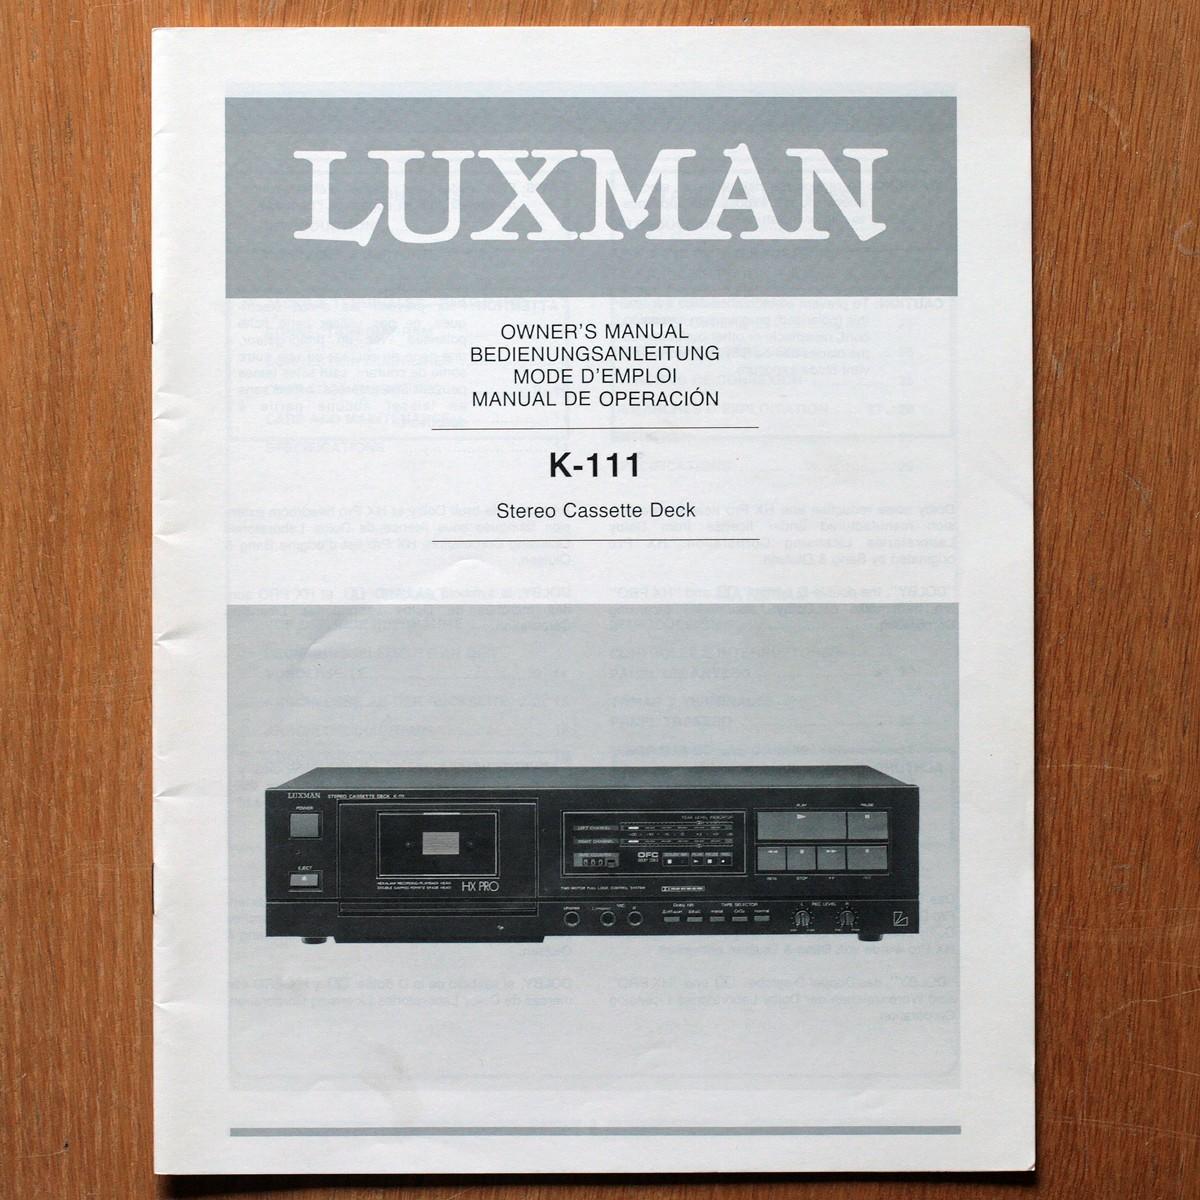 Luxman • Magnétophone à cassettes • K-111 • Manuel utilisateur • User manual • Bedienungsanleitung • Manual de operación